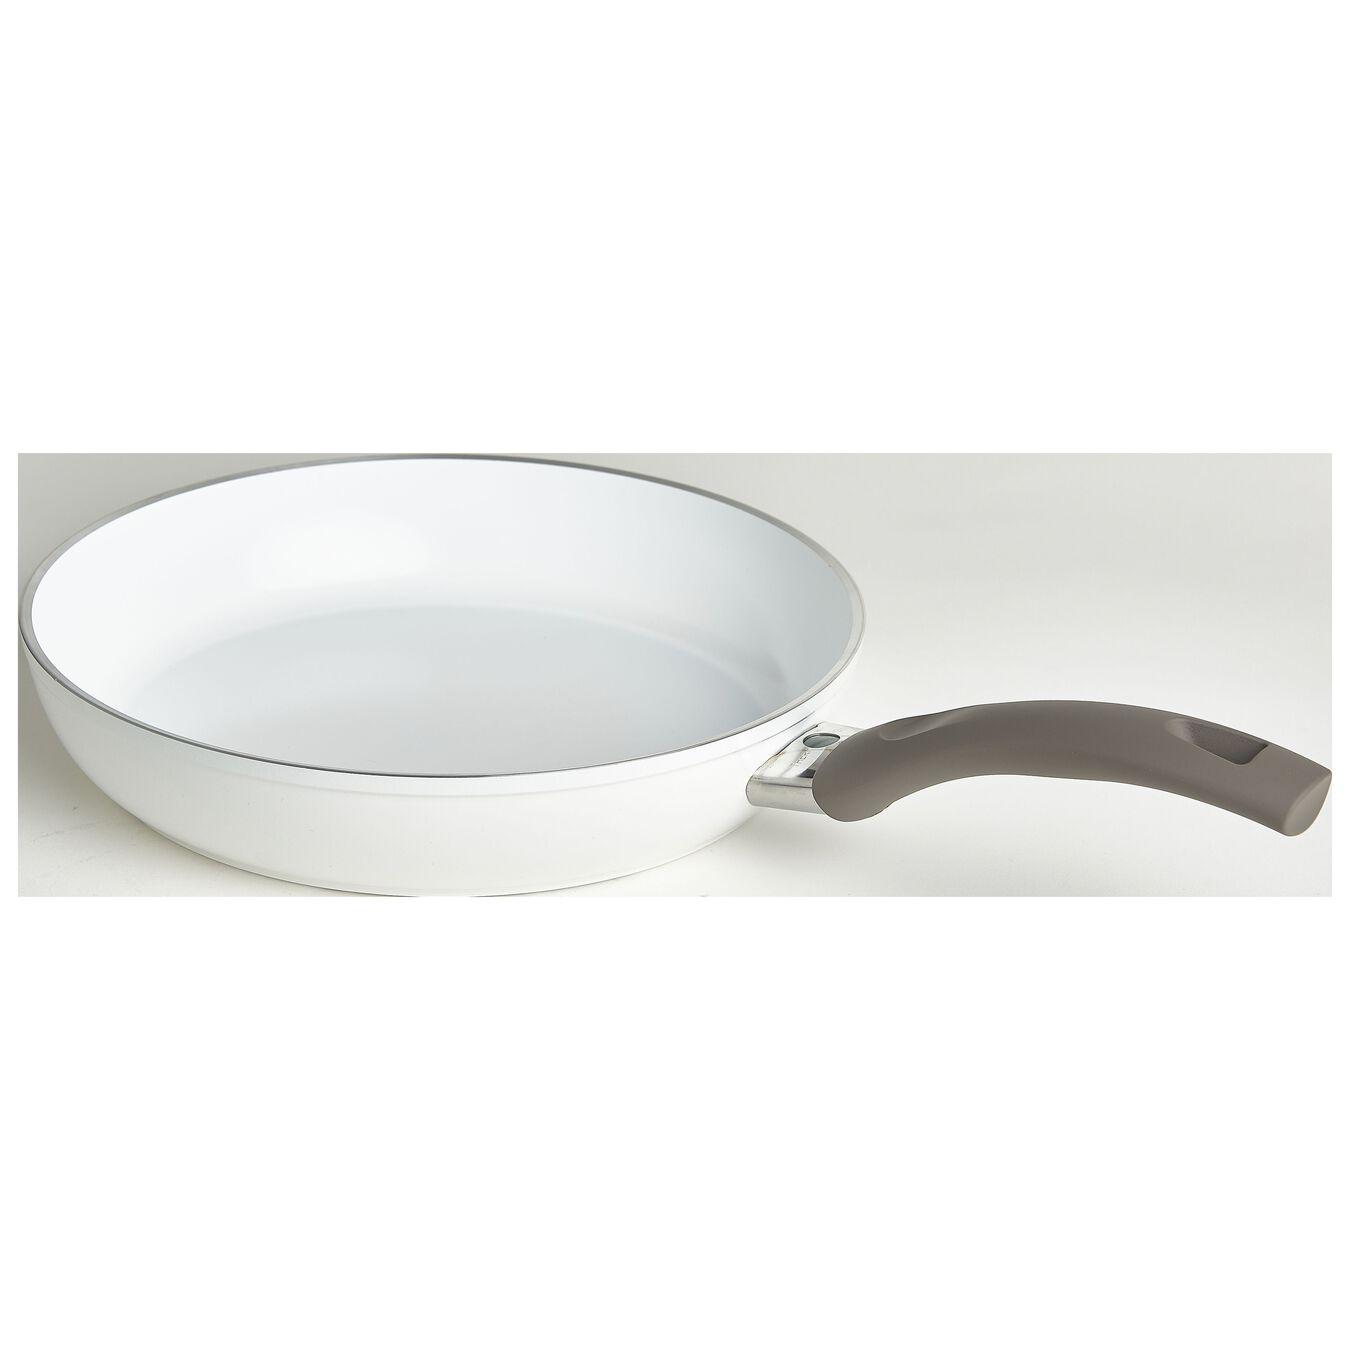 Bratpfanne flach 20 cm, Aluminium, Weiß,,large 1